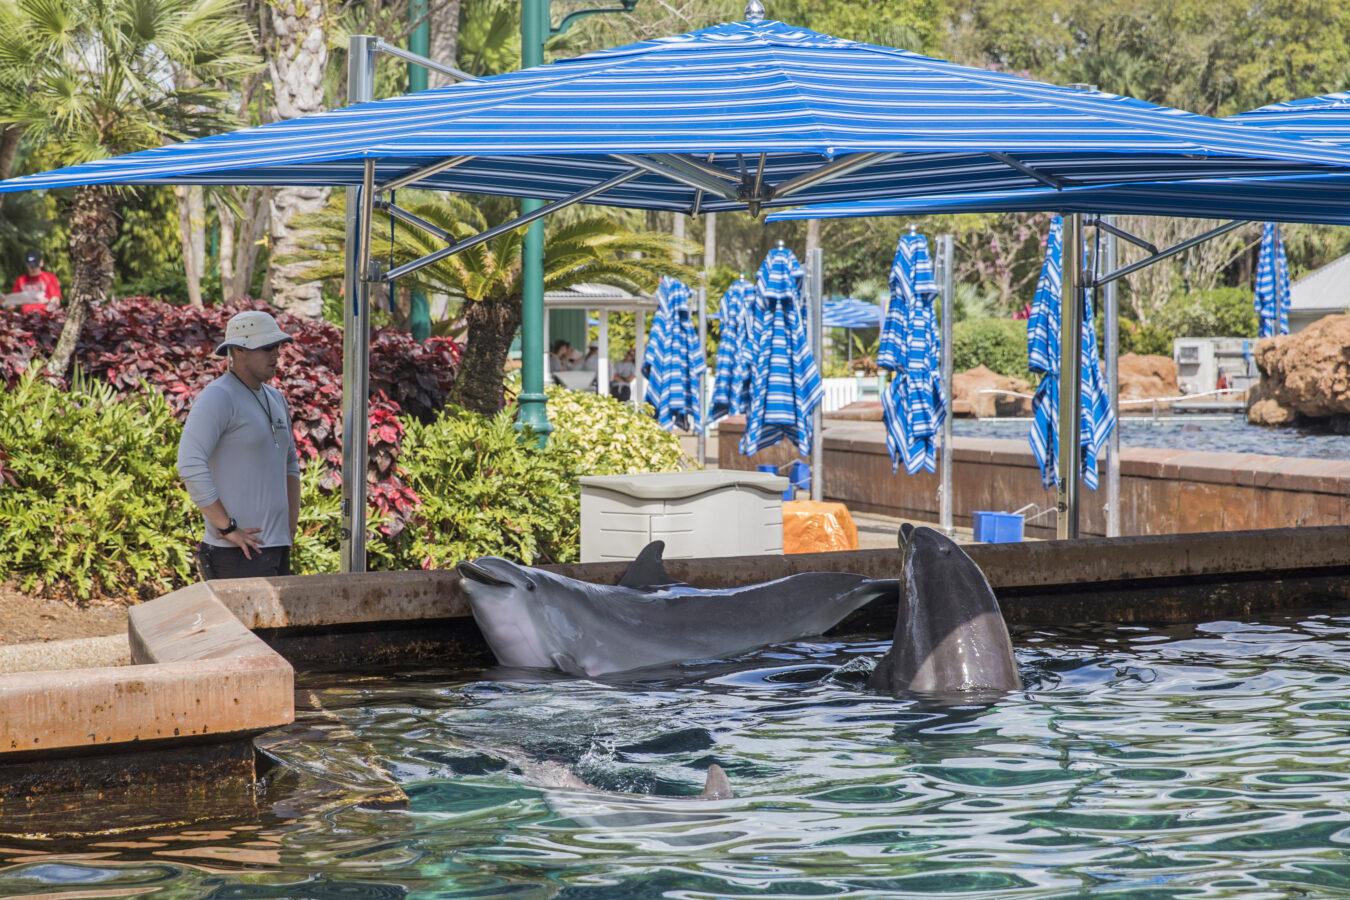 Seaworld Dolphin Pool